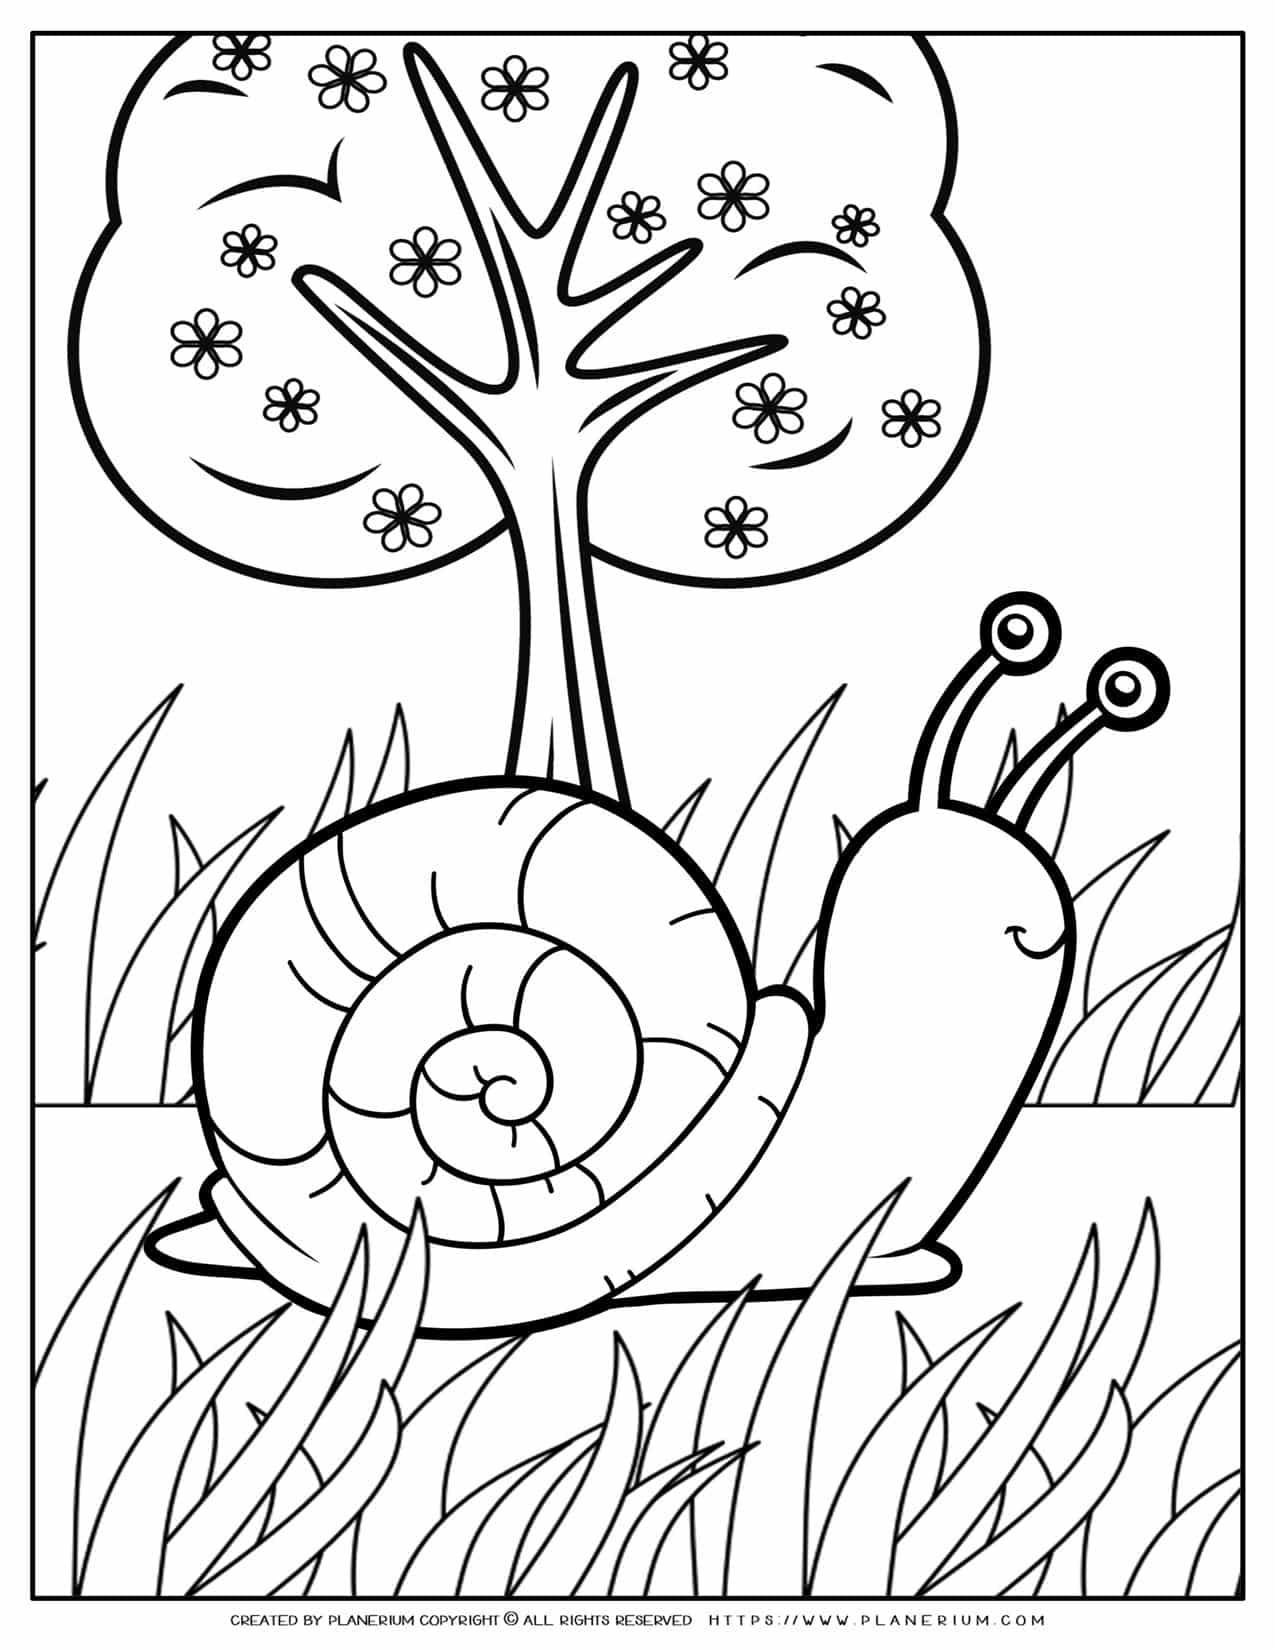 Animals Coloring Page - Snail   Planerium